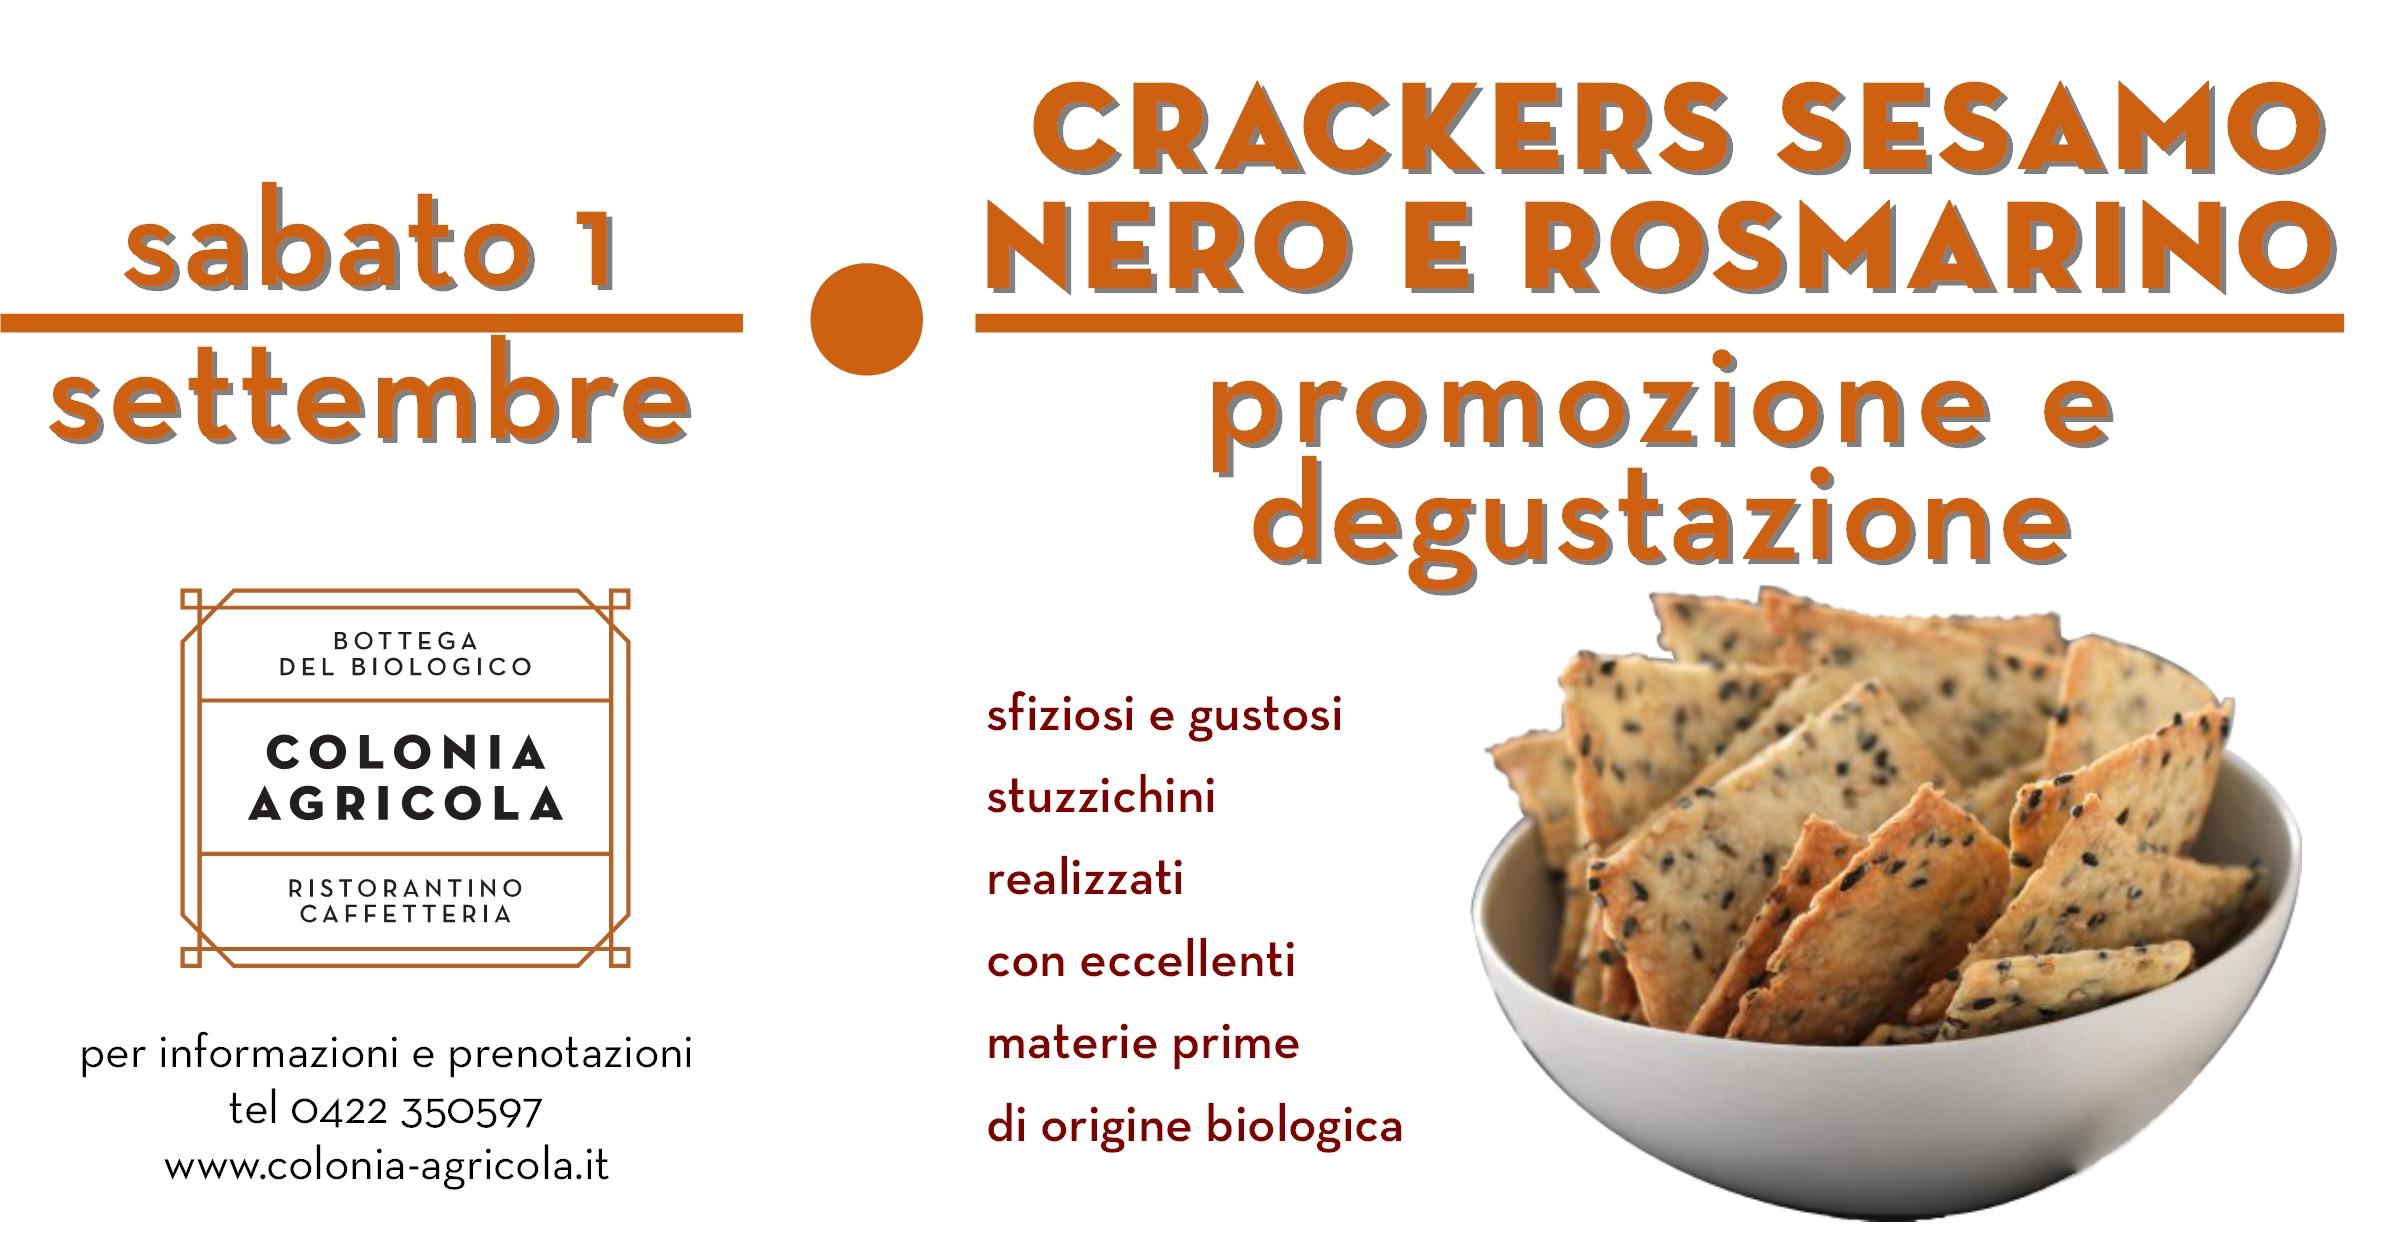 Crackers sesamo nero e rosmarino